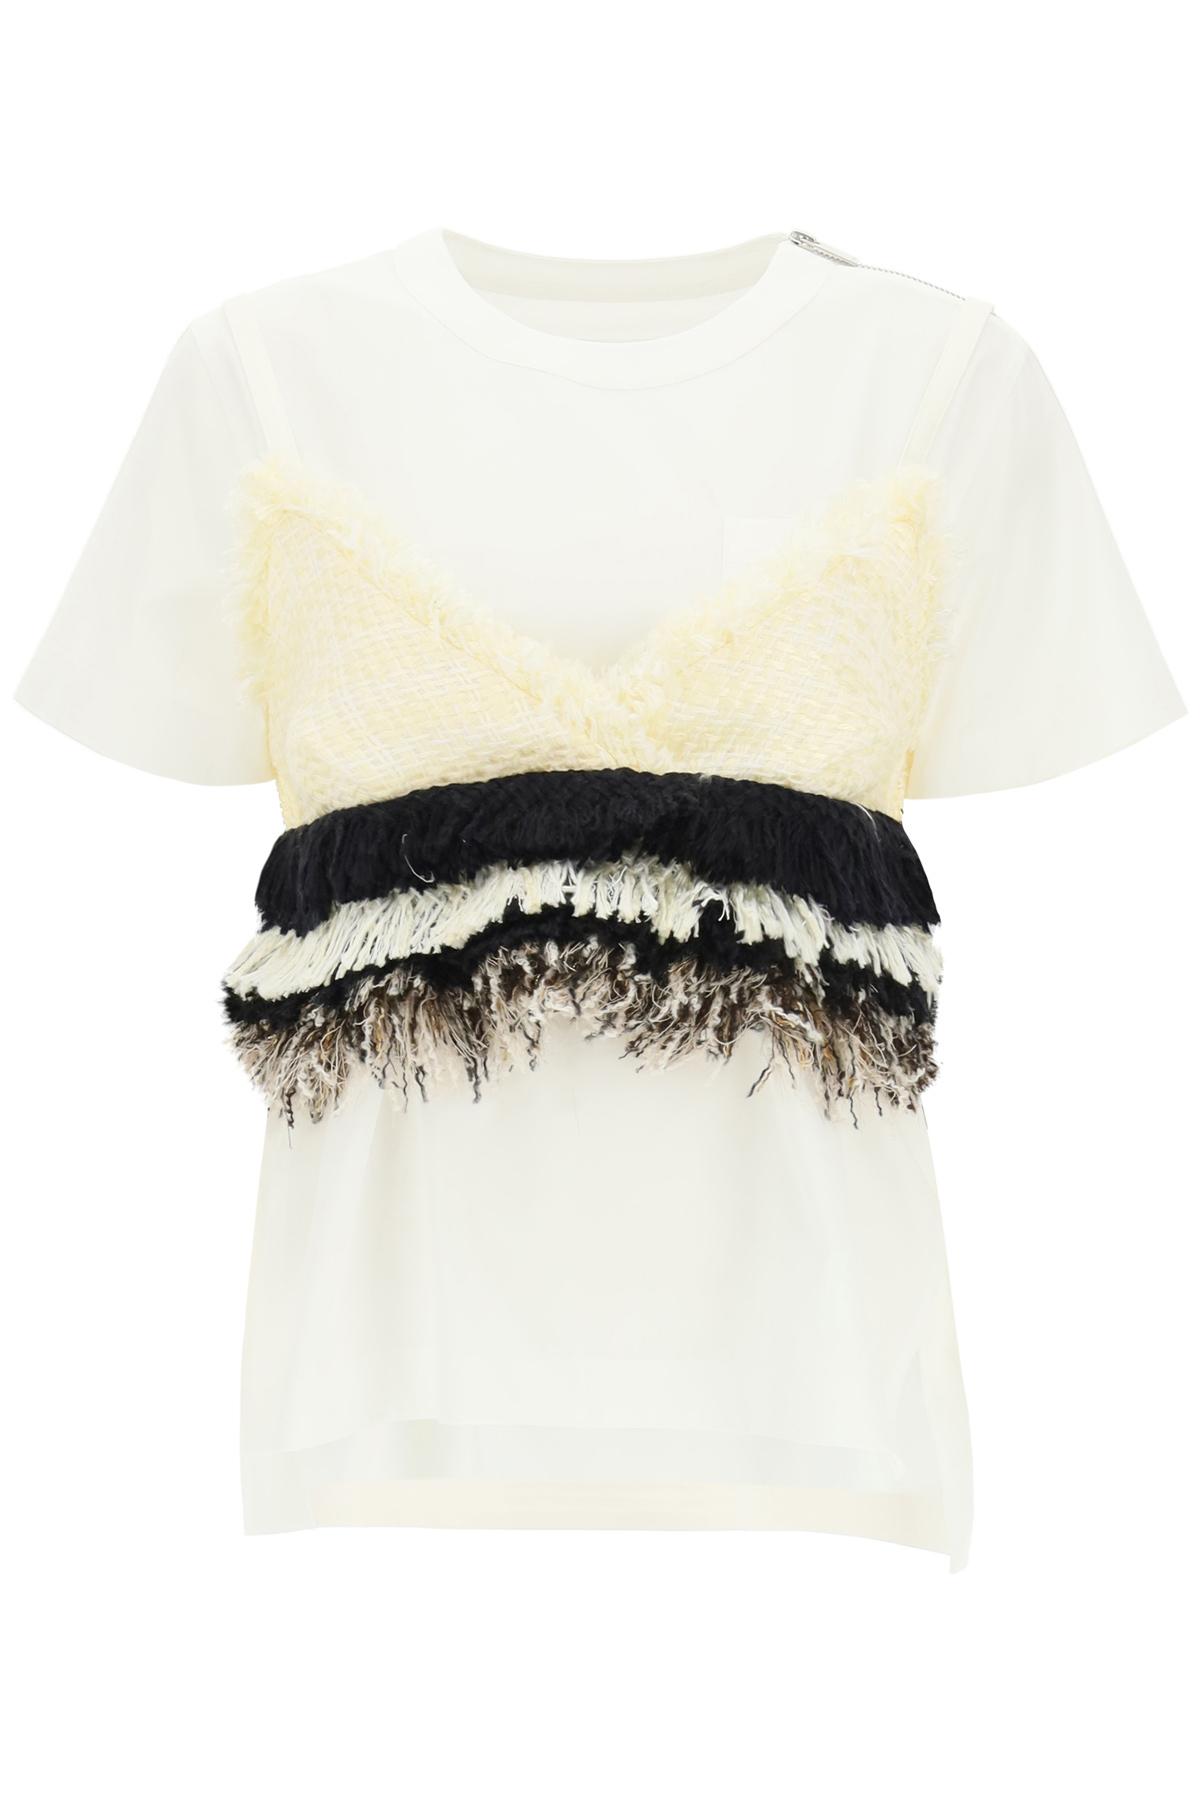 SACAI T-SHIRT WITH TWEED TOP 2 White, Black, Beige Cotton